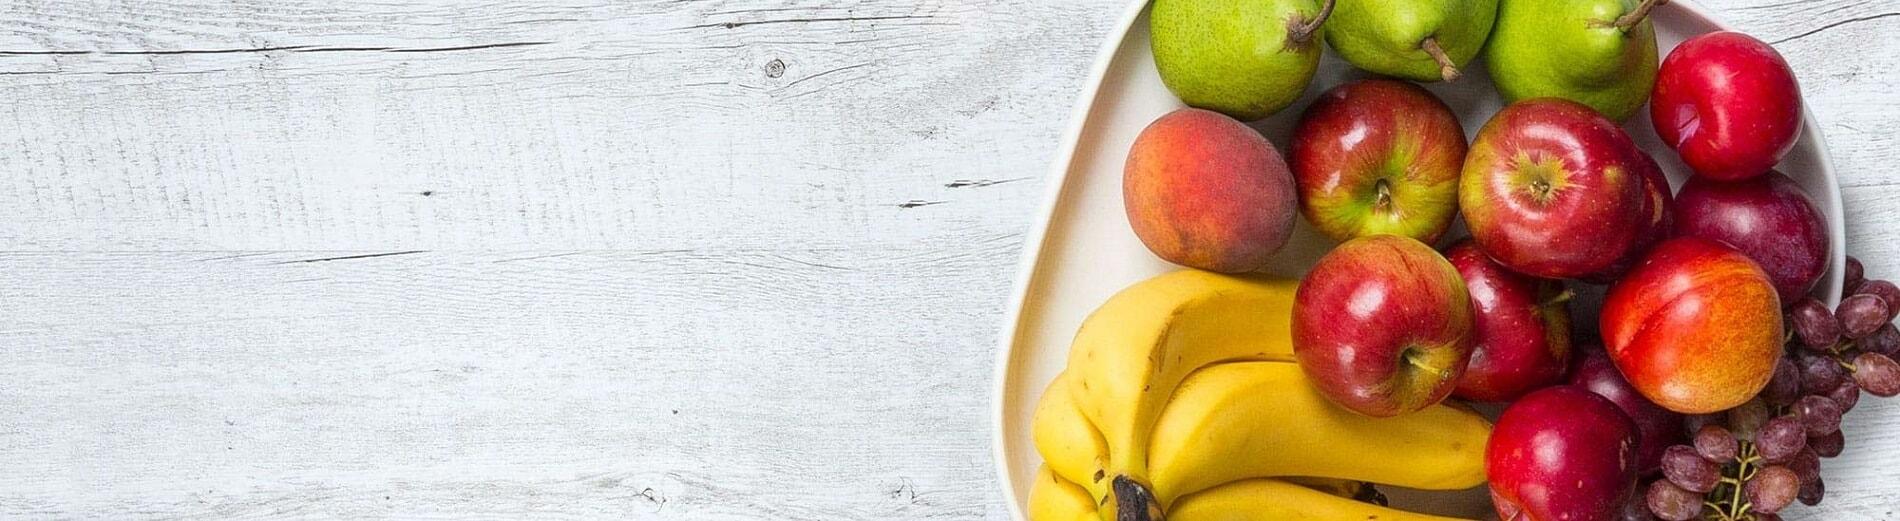 Vinfruits banner